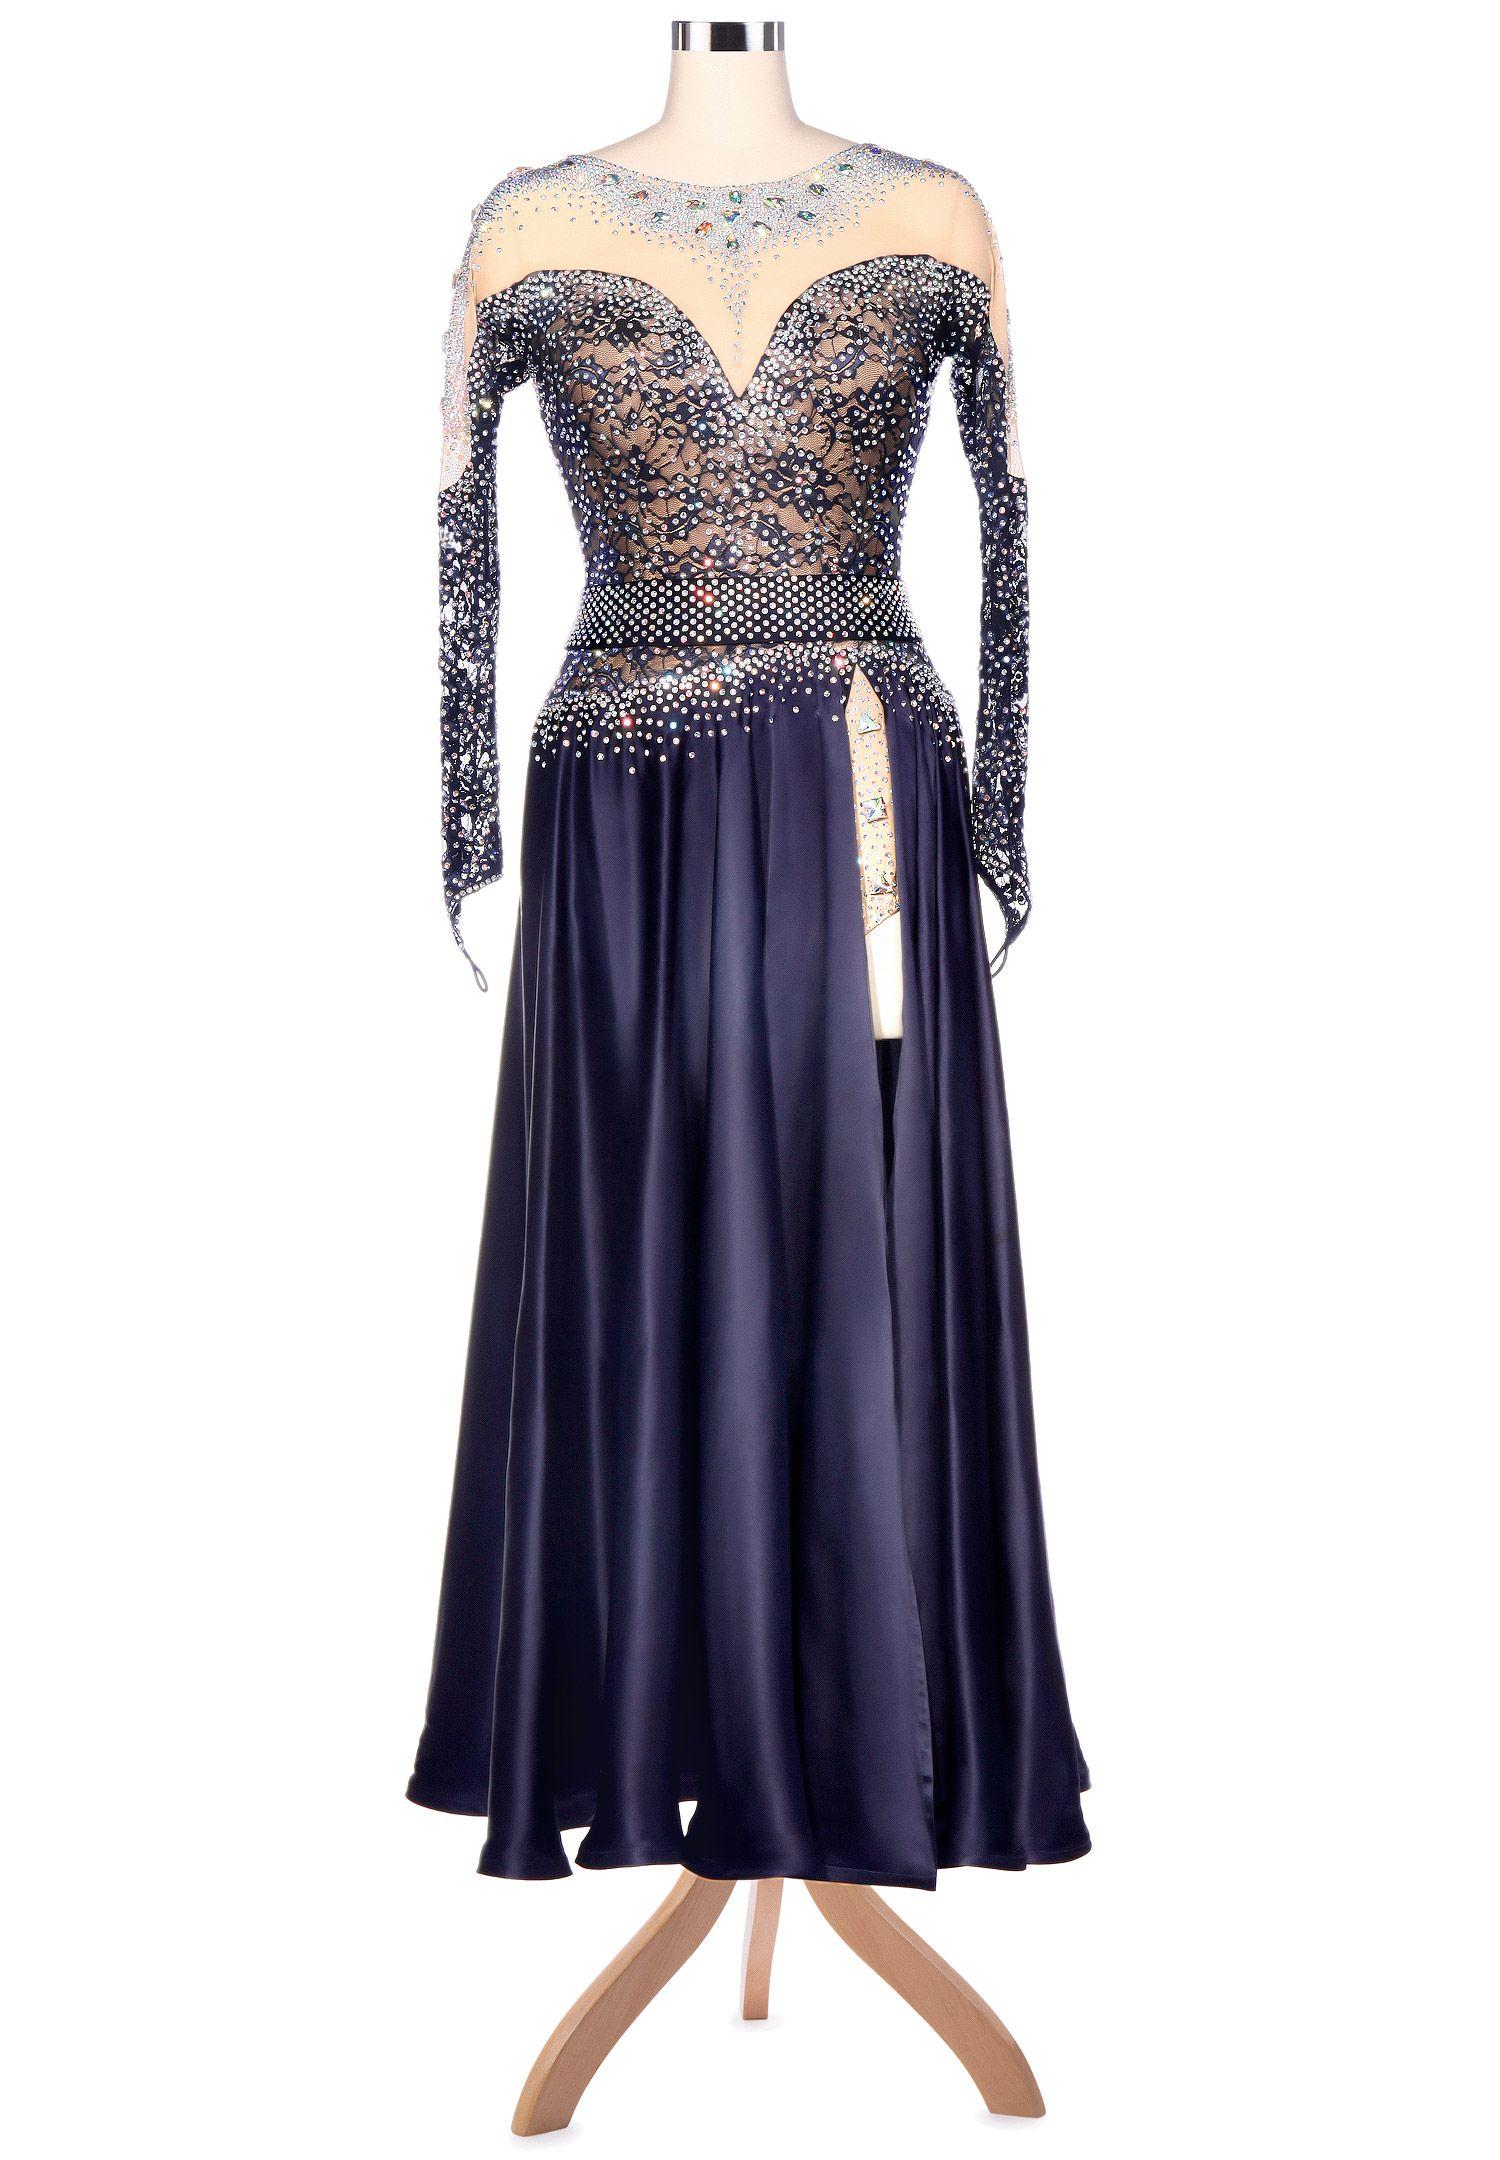 7b62cde25cf0 Sweetheart Sparkle Side Split American Smooth Dance Dress A5206 Ballroom  Gowns, Side Split, Ballrooms